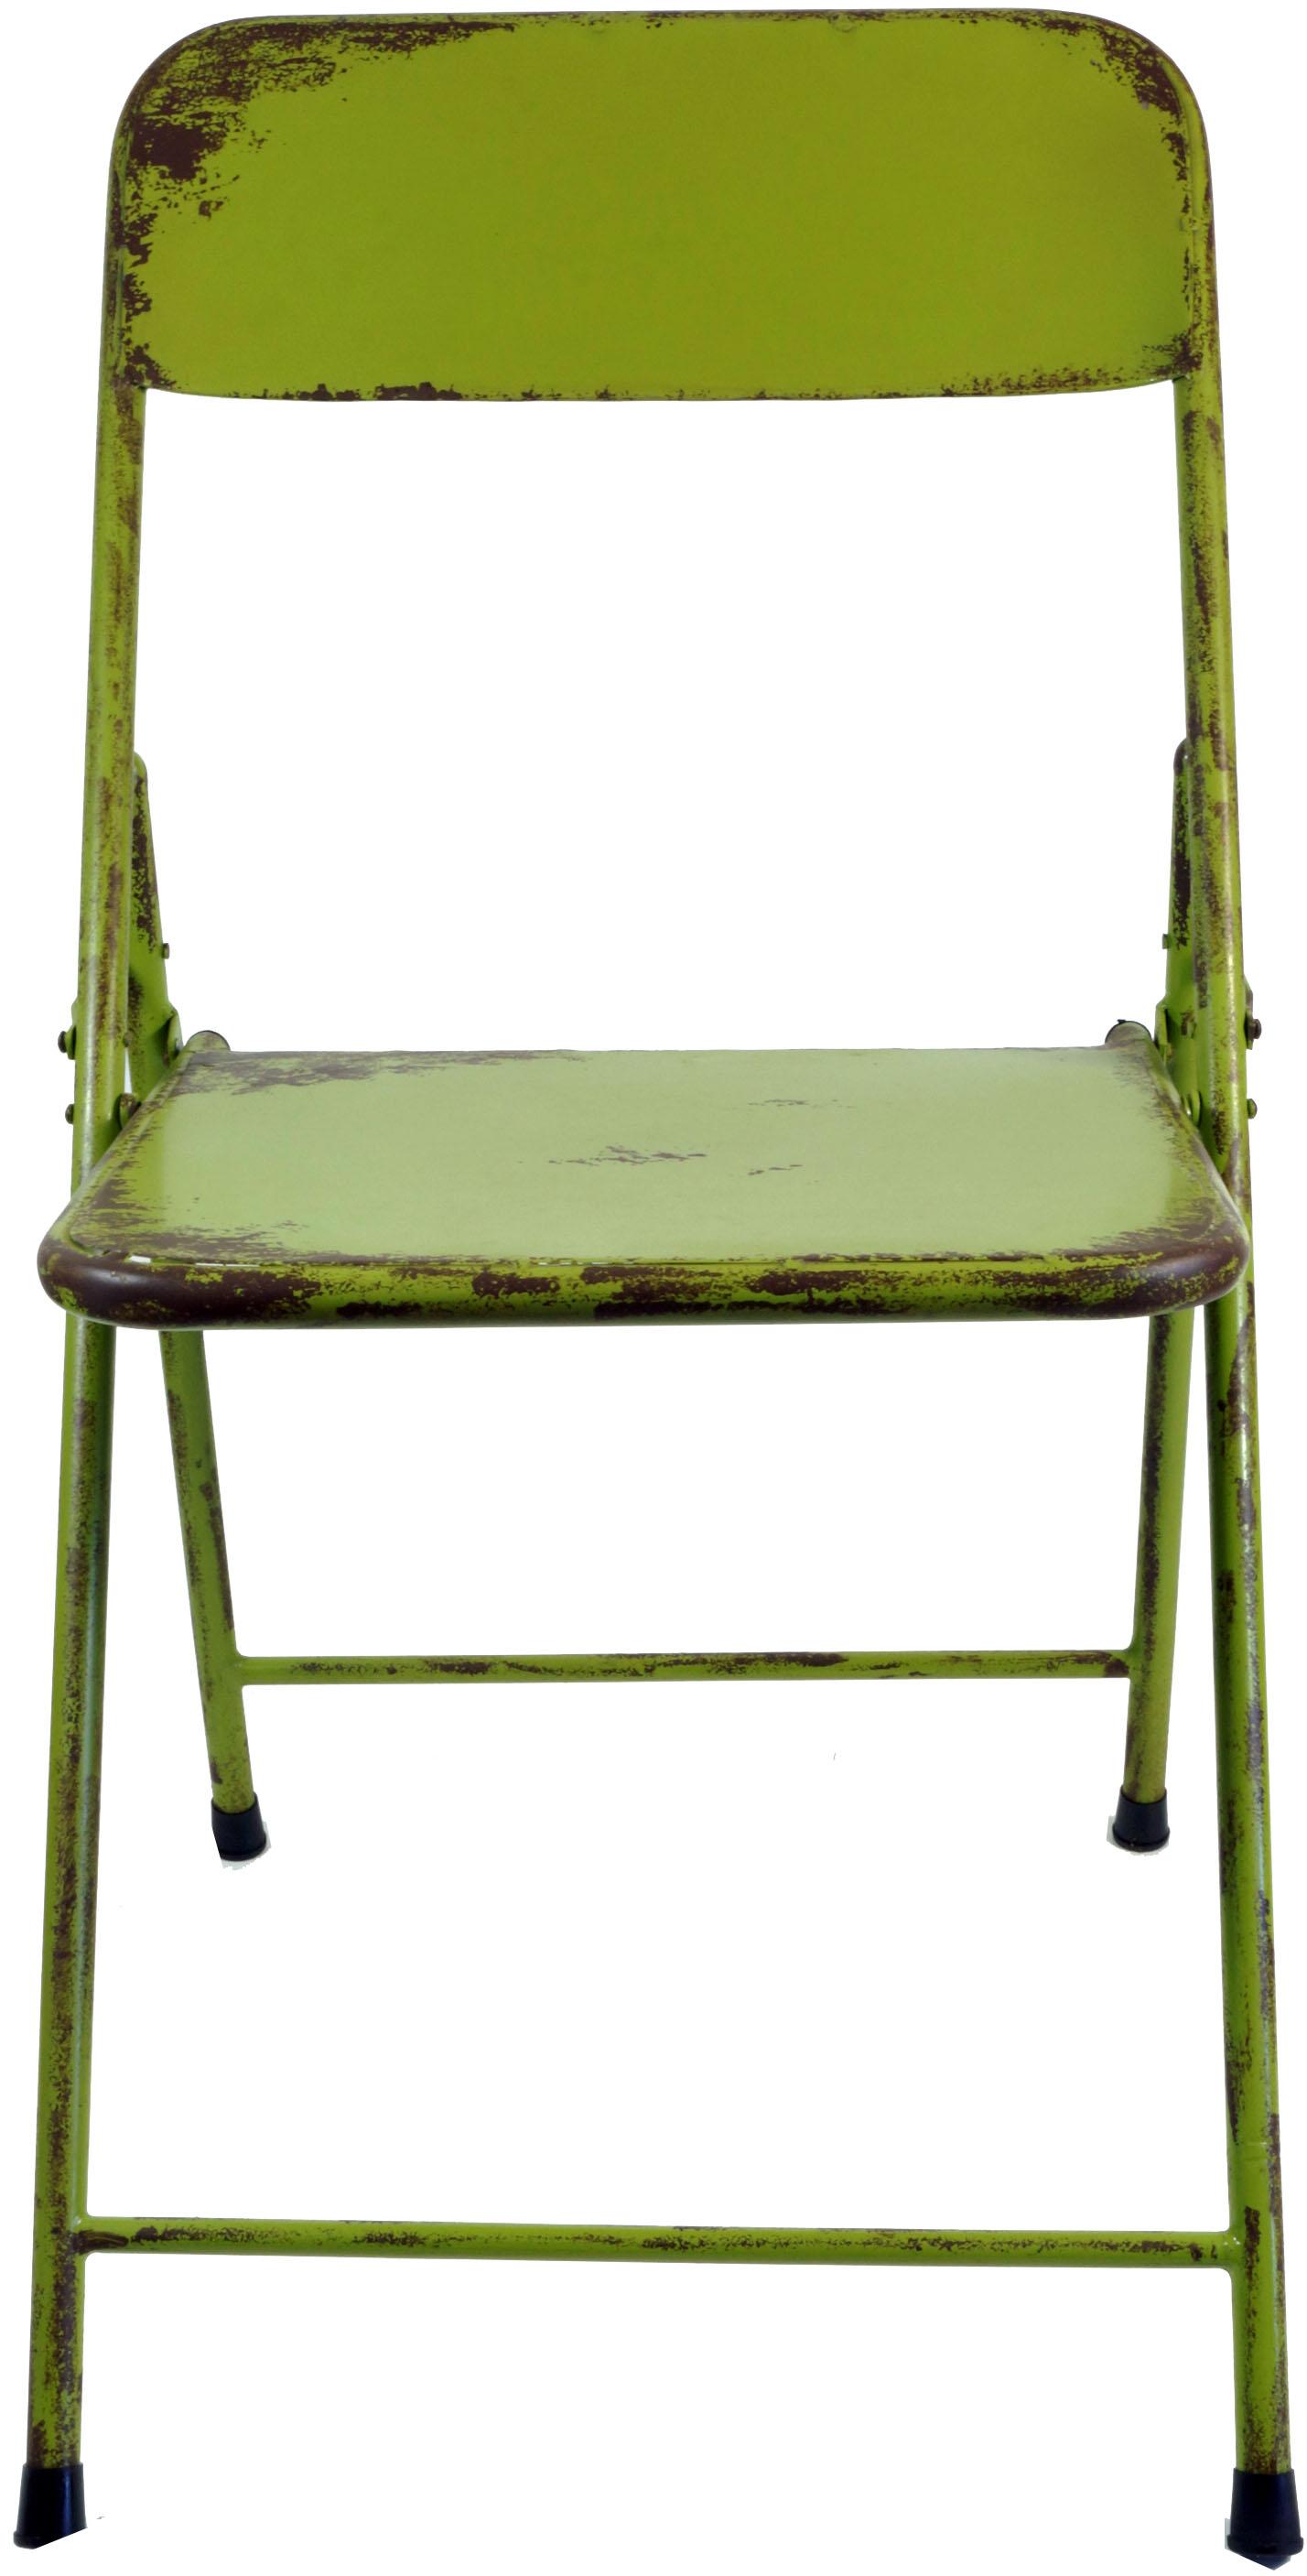 klappstuhl aus metallrohr im industrial vintage design gr n 80x42x50 cm. Black Bedroom Furniture Sets. Home Design Ideas